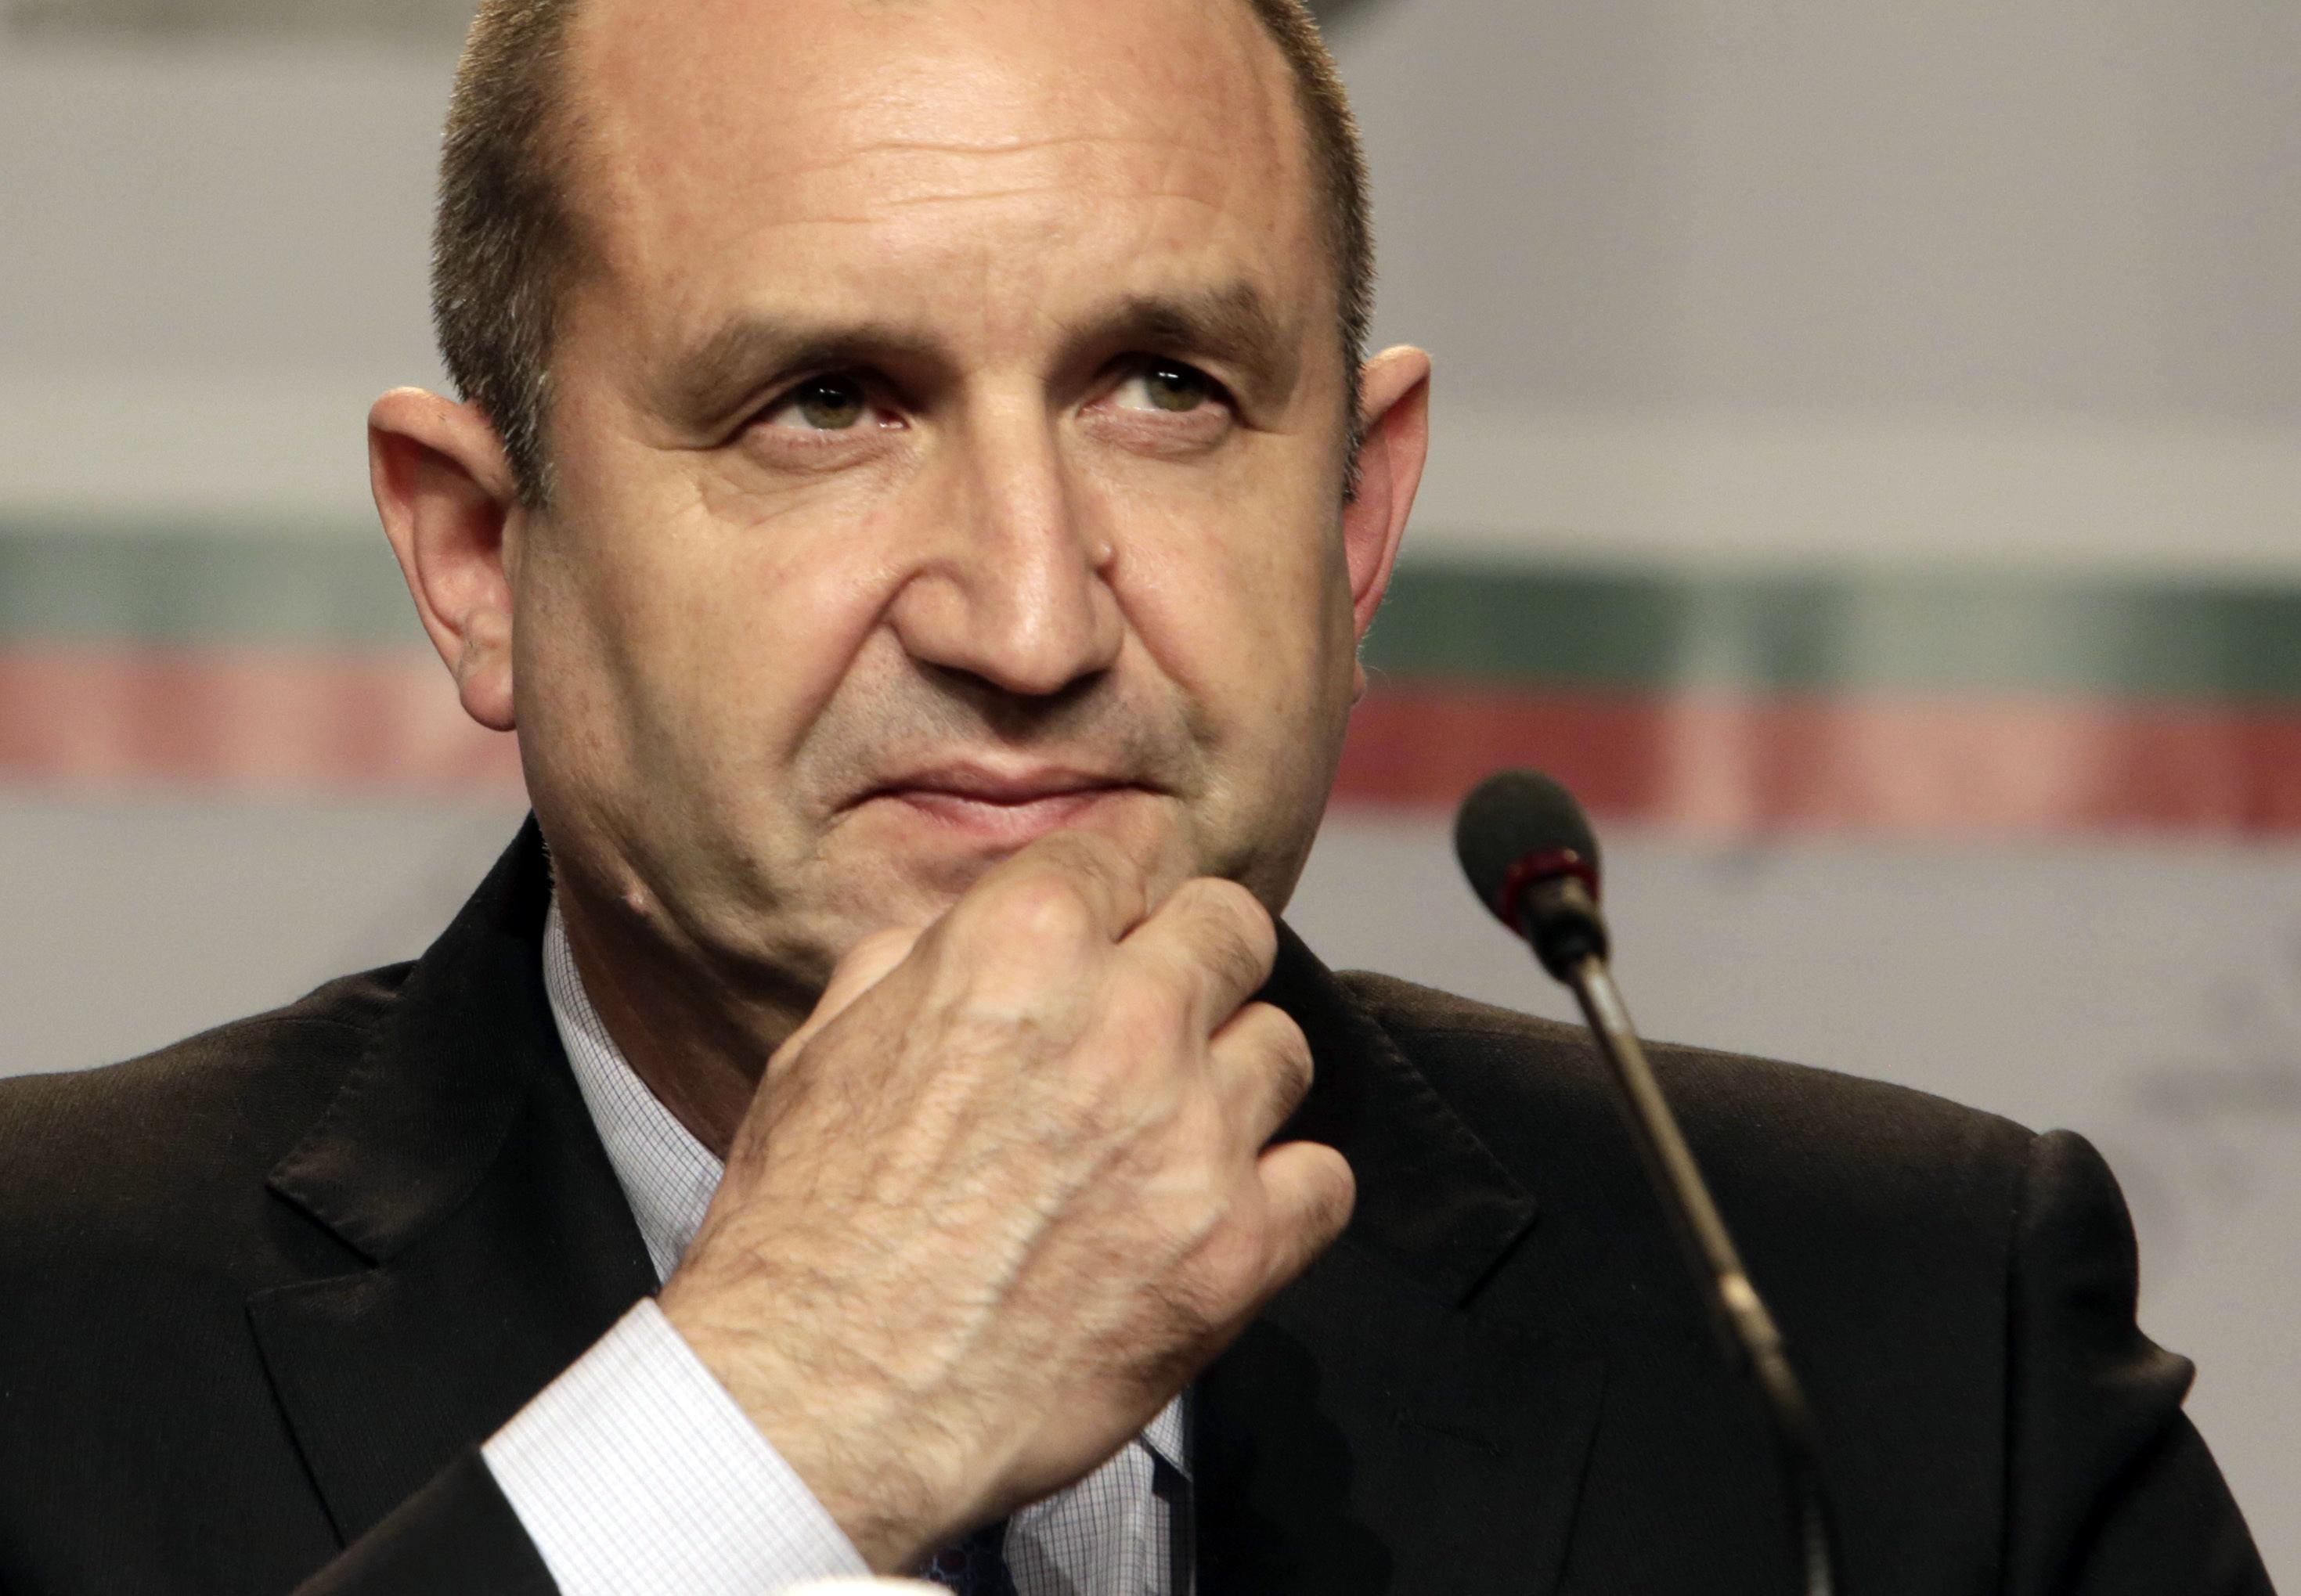 Alegeri prezidentiale in Bulgaria. Primele exit poll-uri il dau castigator pe pro-rusul Radev. Premierul bulgar a demisionat